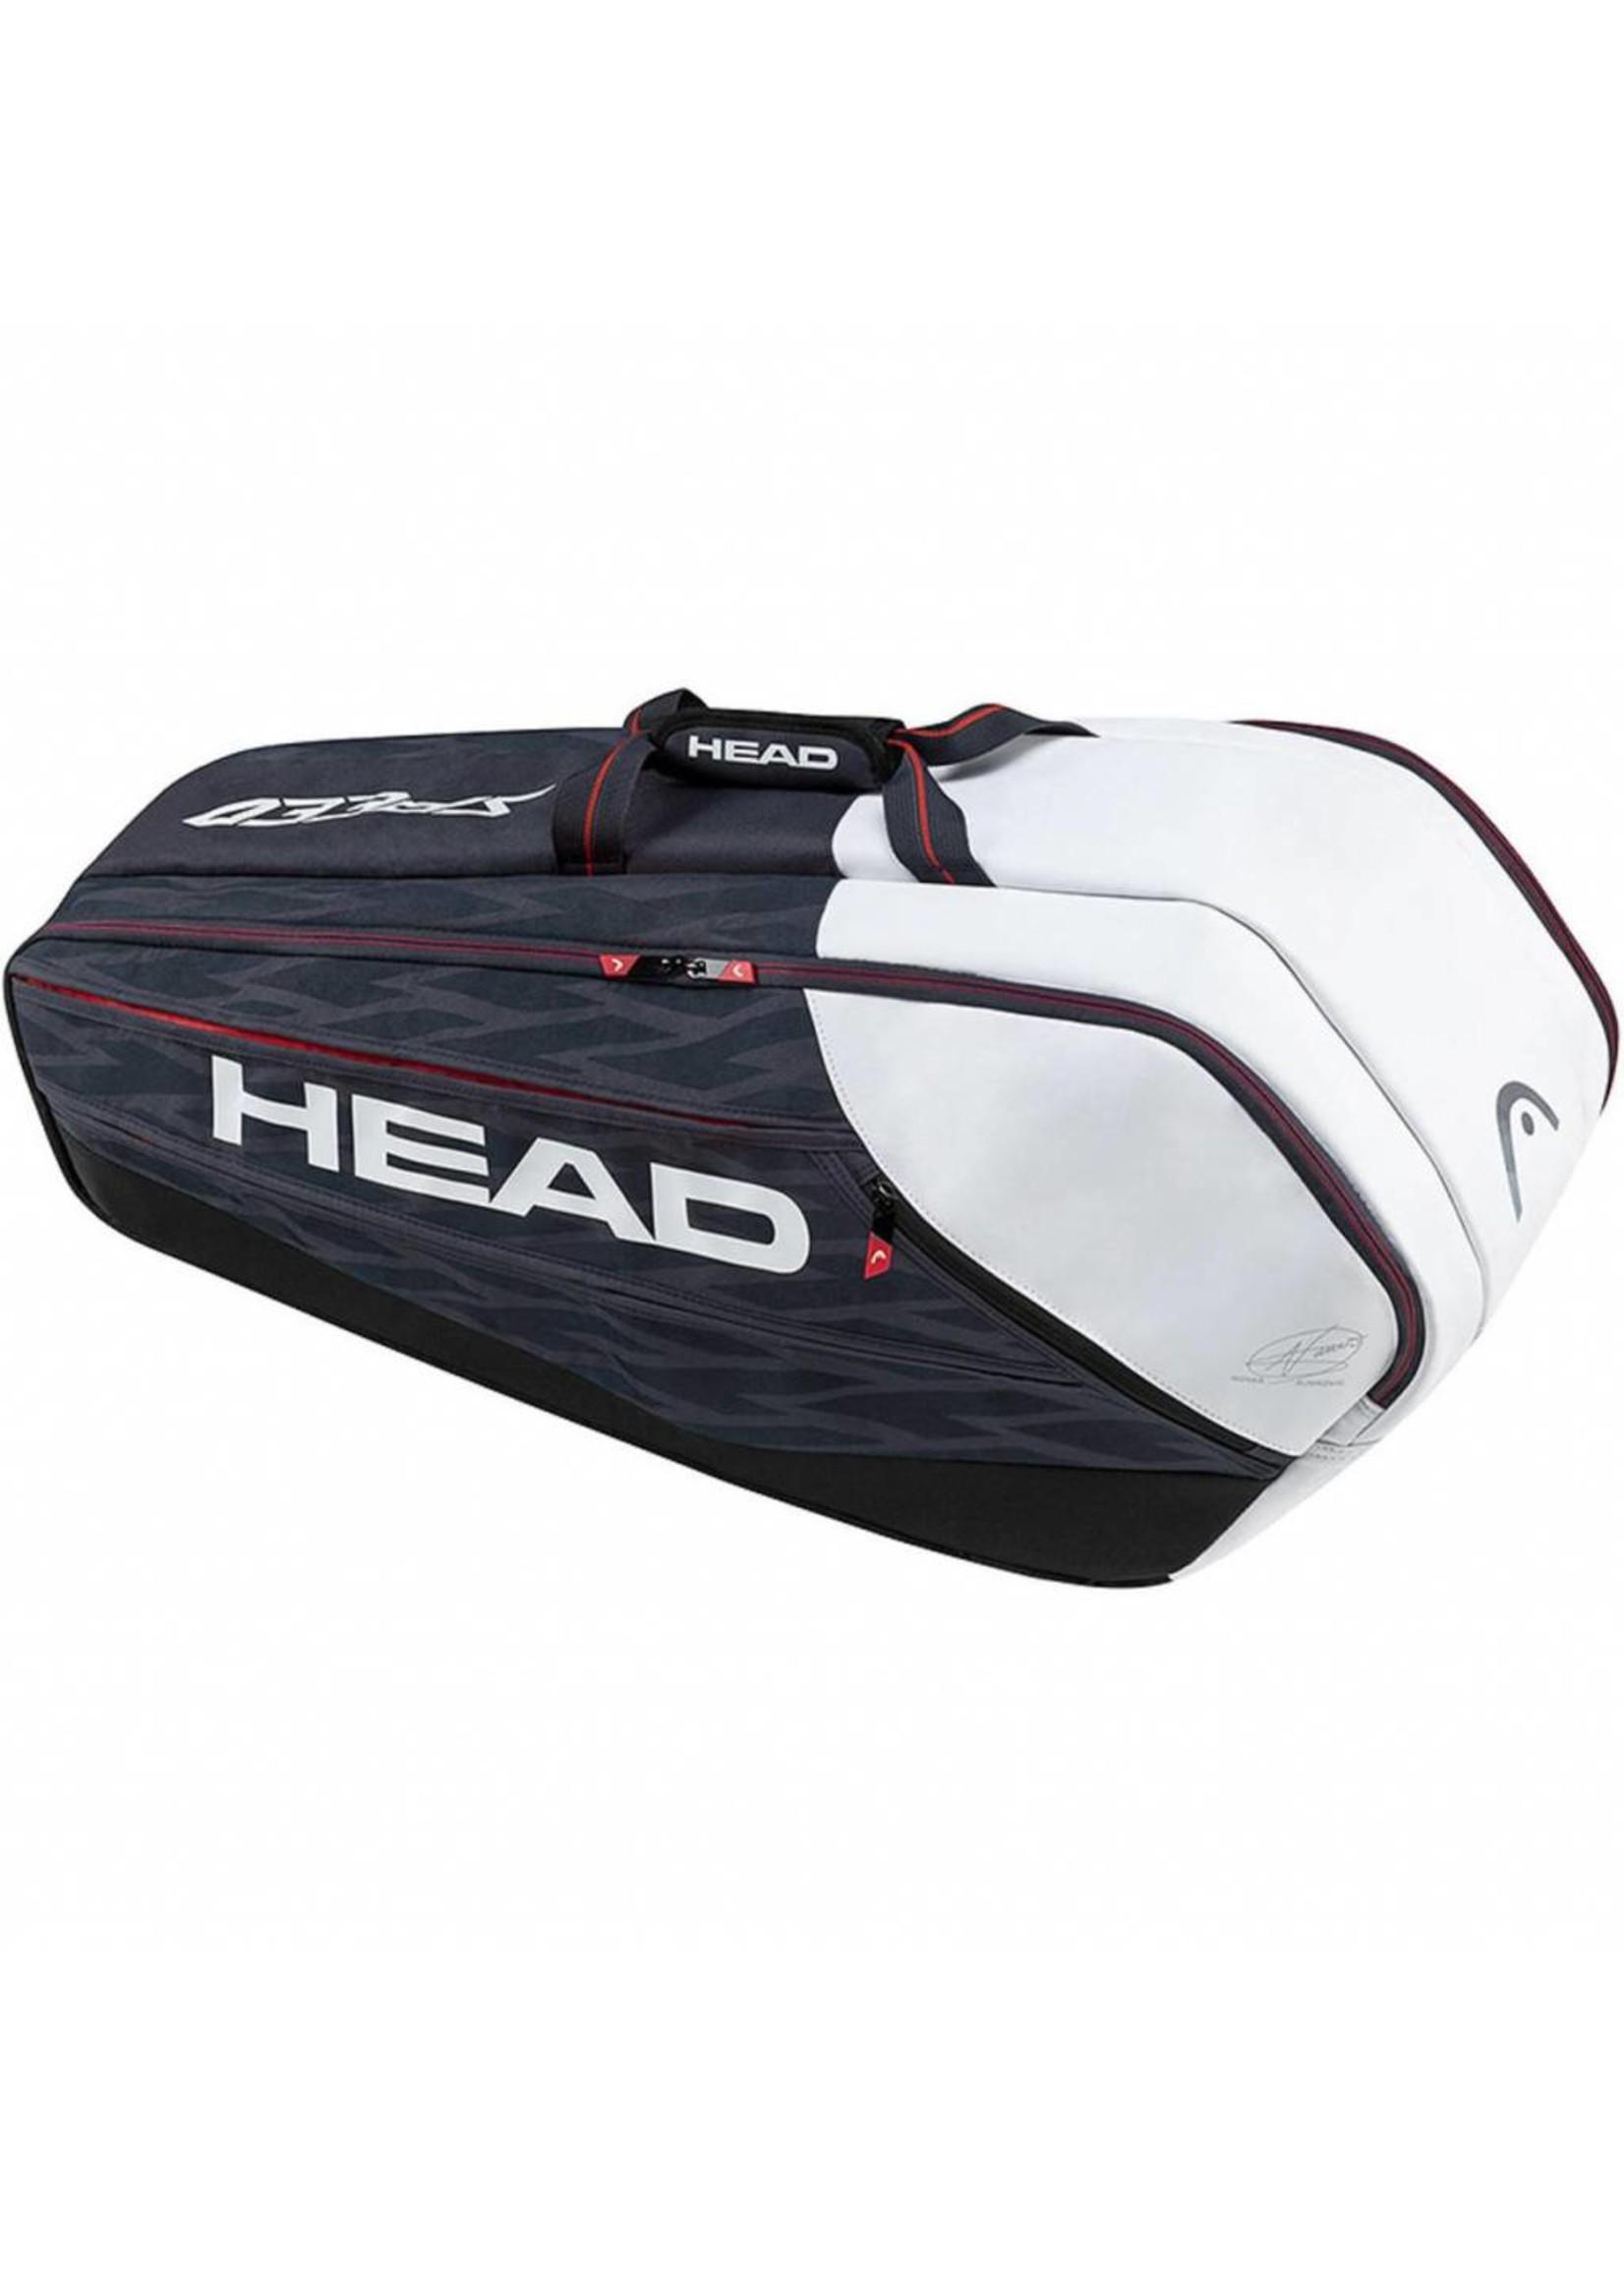 Head Head Djokovic Super Combi 9 Racket Bag